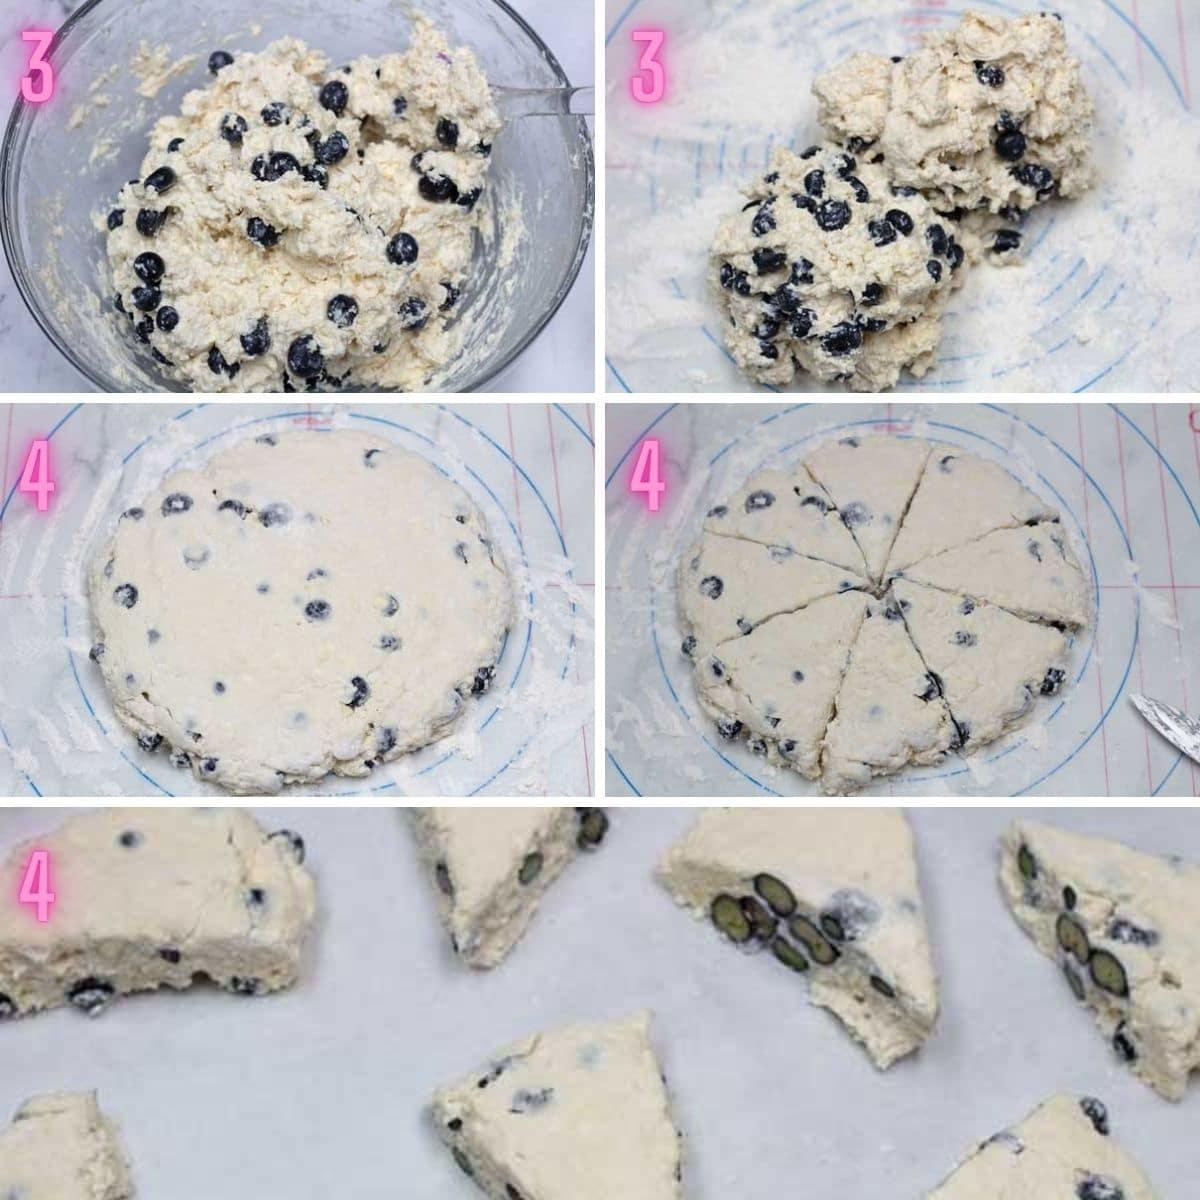 Urutan proses scones cream keju biru 2.